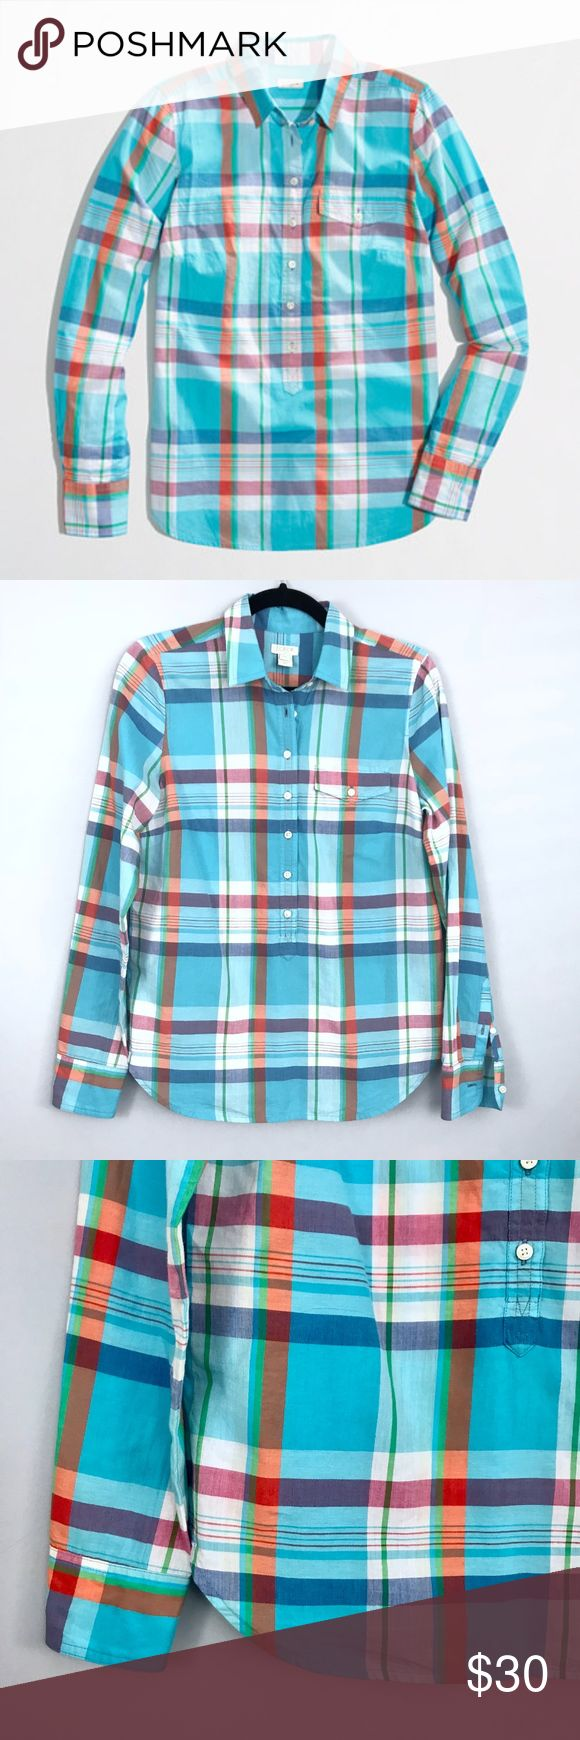 J. Crew Factory Plaid Popover Shirt - XSmall